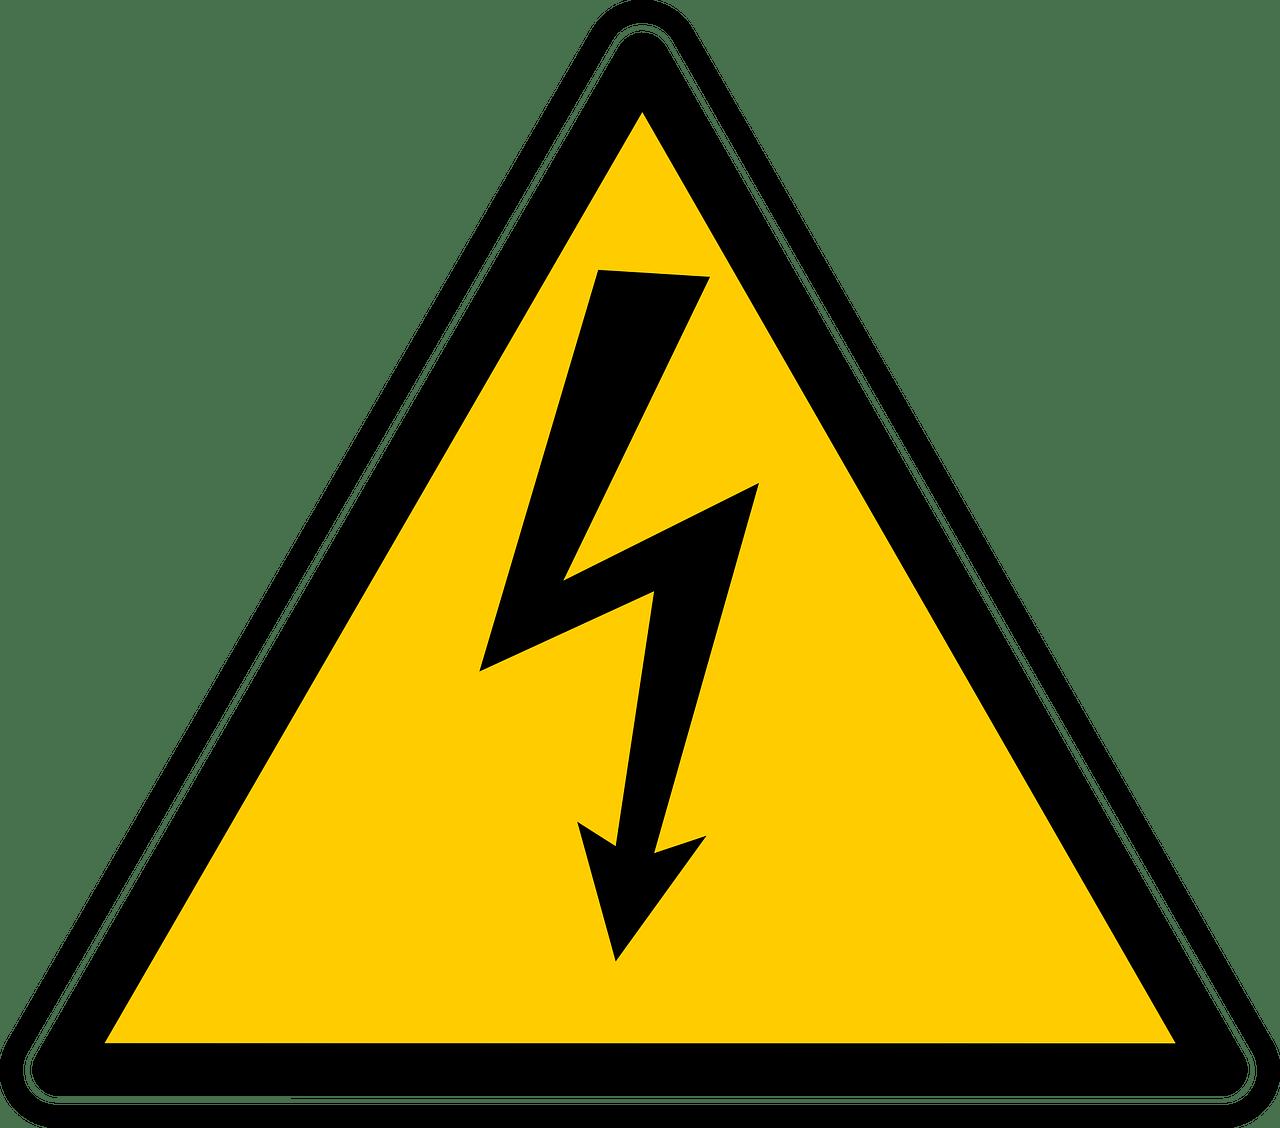 señal peligro rayos